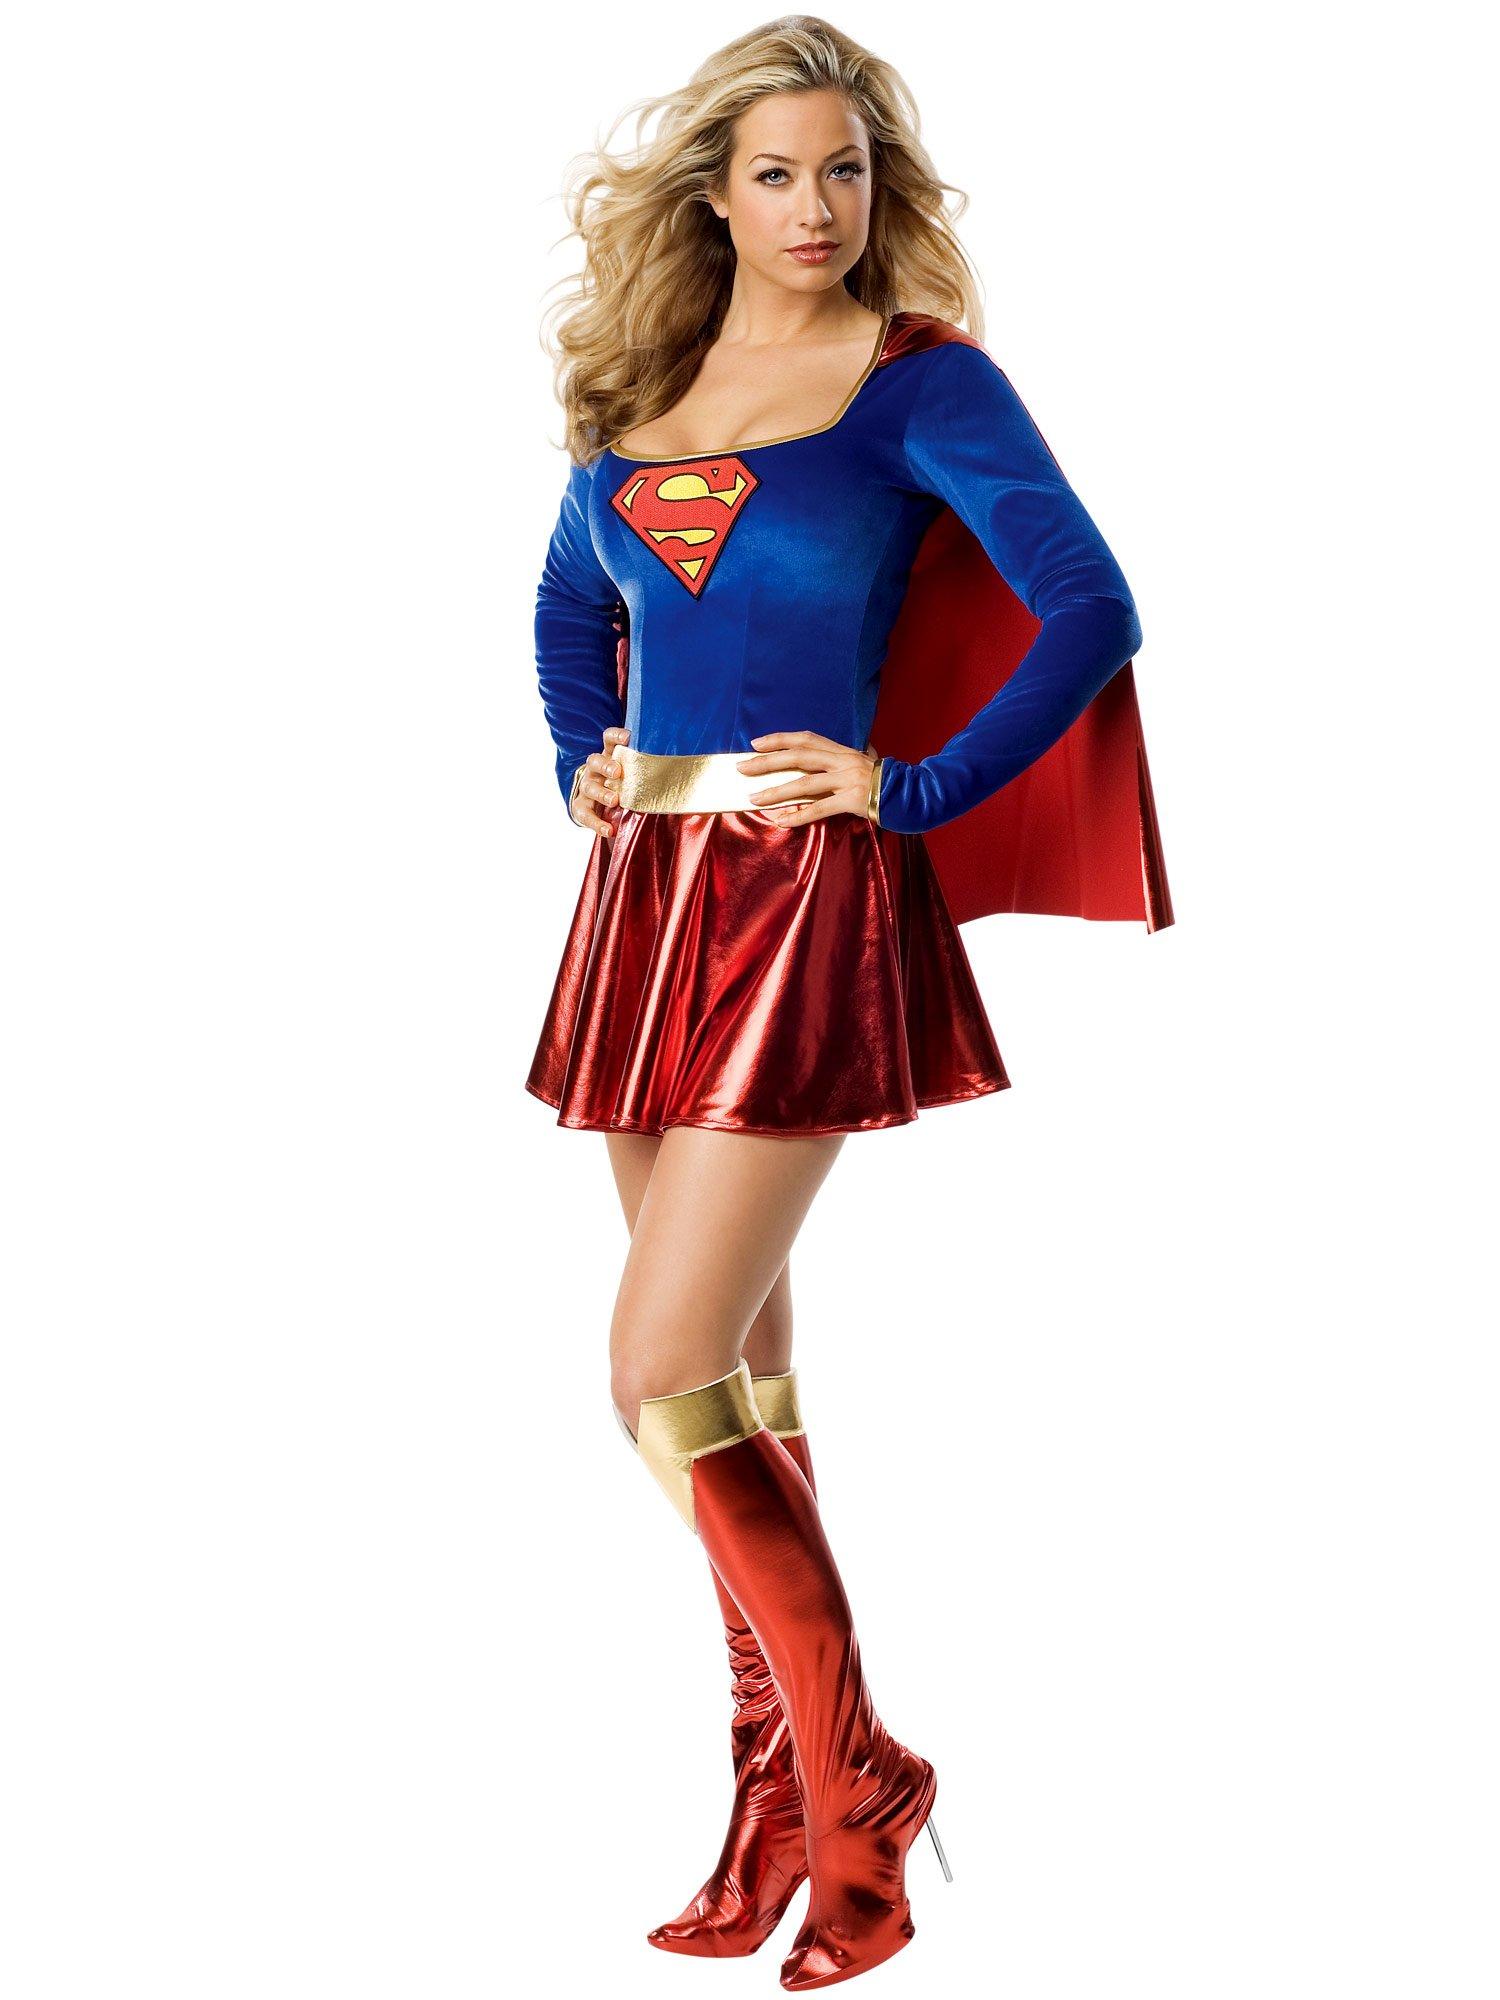 Secret Wishes Women's Adult Supergirl Costume, Blue/Red, Medium